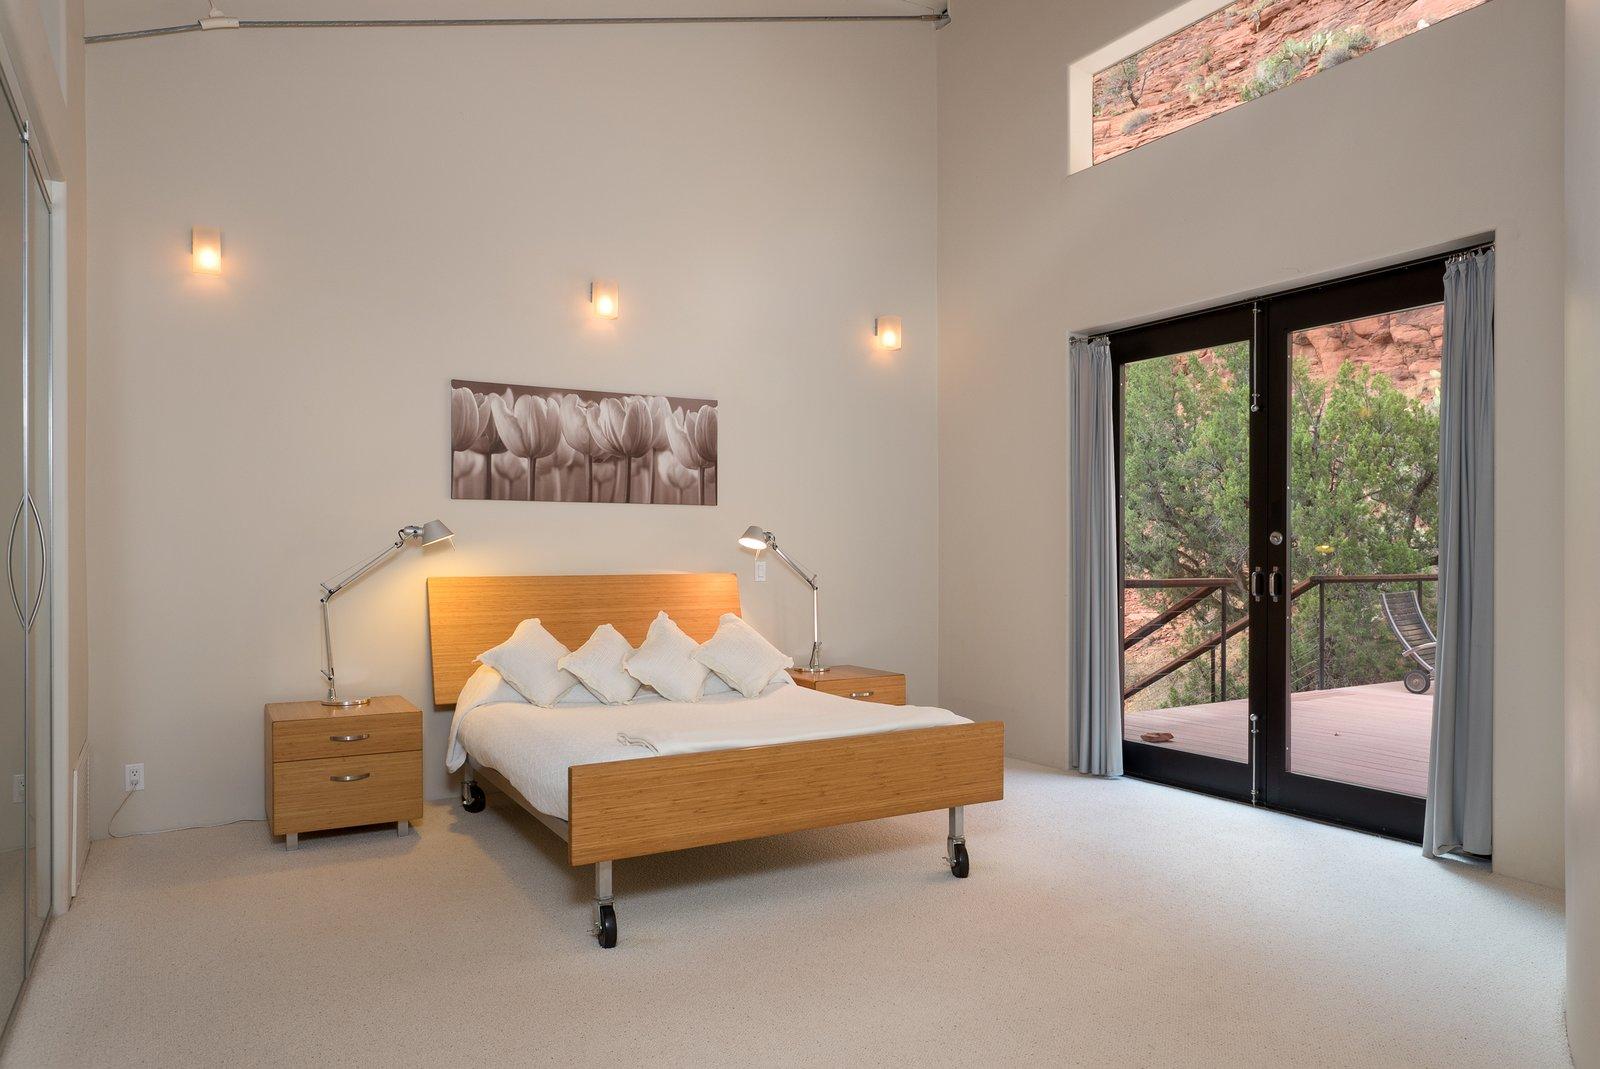 Bedroom, Bed, Lamps, Carpet Floor, Night Stands, and Wall Lighting  2945 Red Rock Loop Rd.